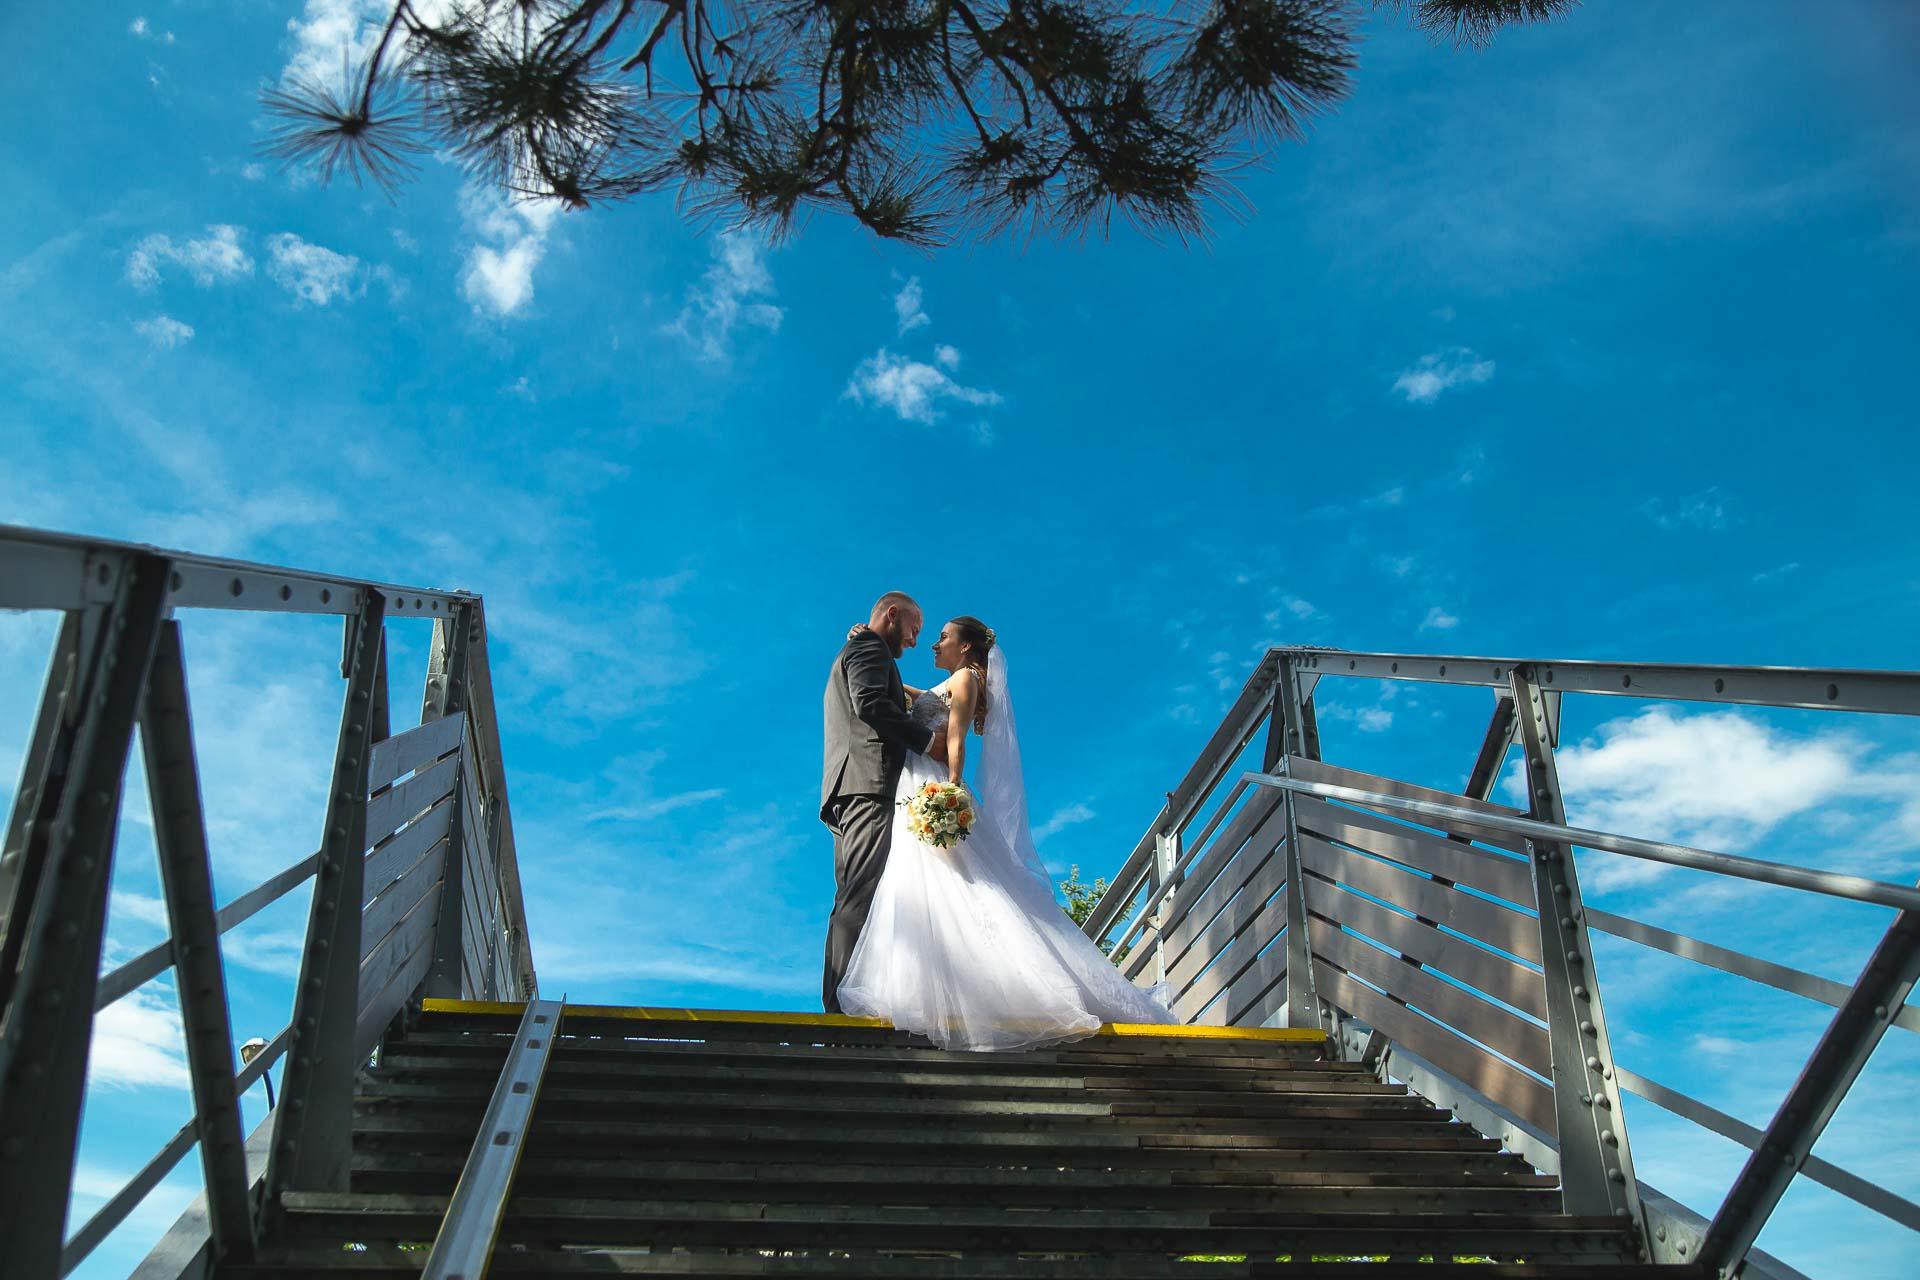 svatební-fotograf-svatebni-video-Nymburk-hotel-Ostrov-Beautyfoto-6155